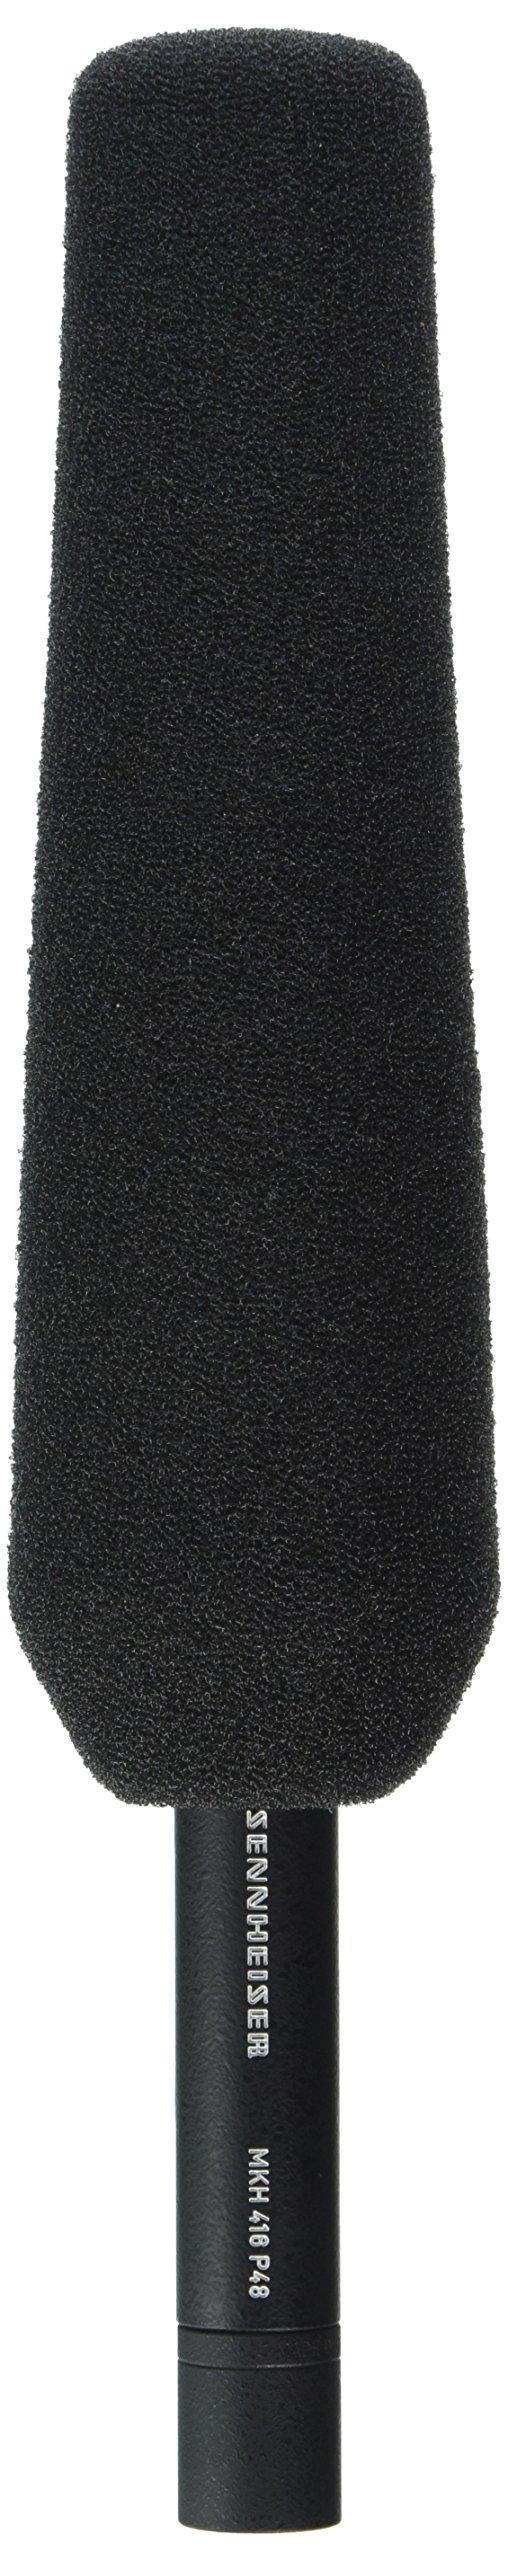 Sennheiser MKH416-P48U3 Super-Cardioid Shotgun Tube Condenser Microphone by Sennheiser (Image #1)